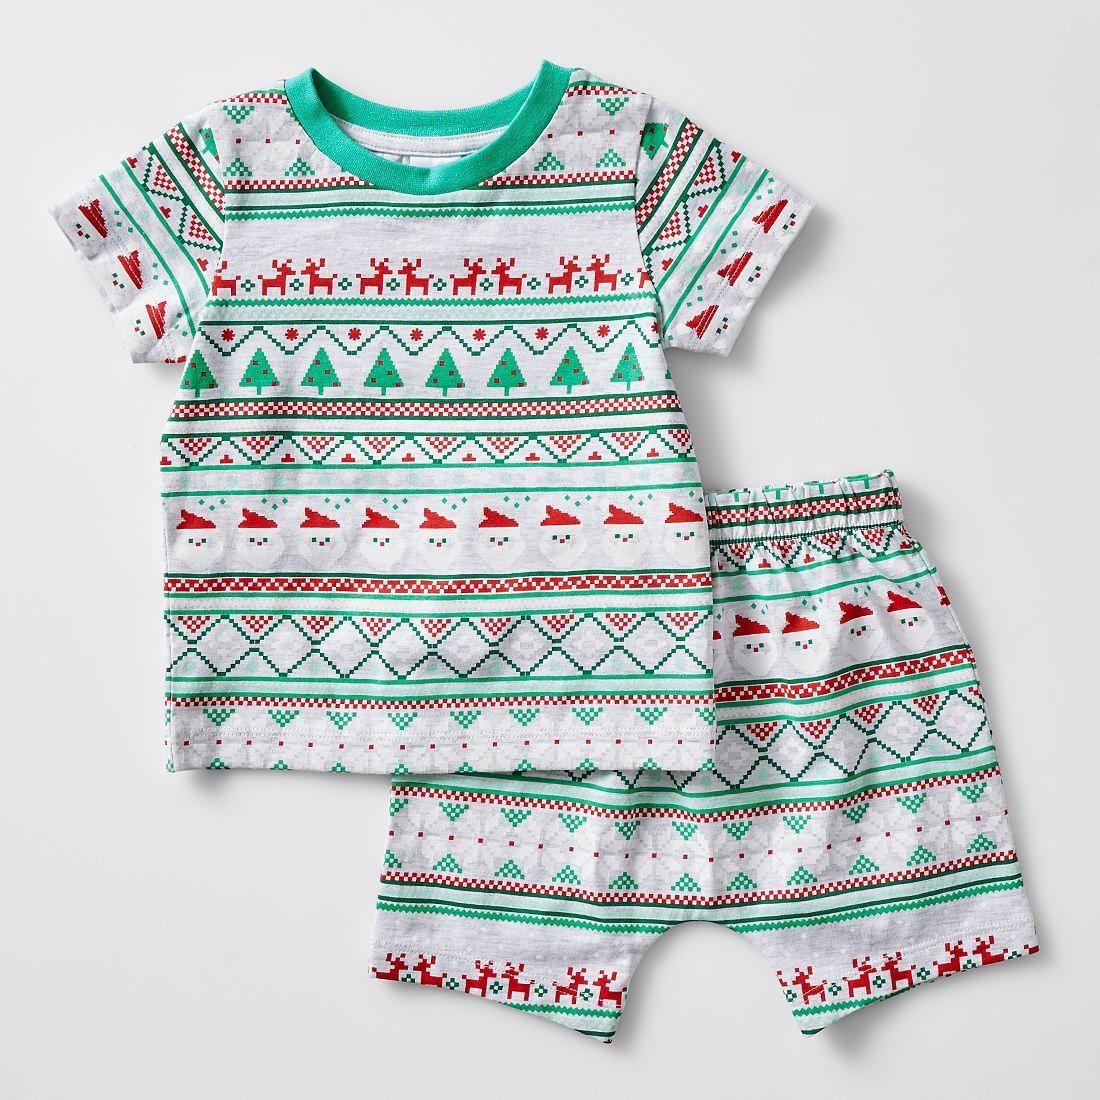 Baby Family Christmas Pyjama Set Target Australia Baby